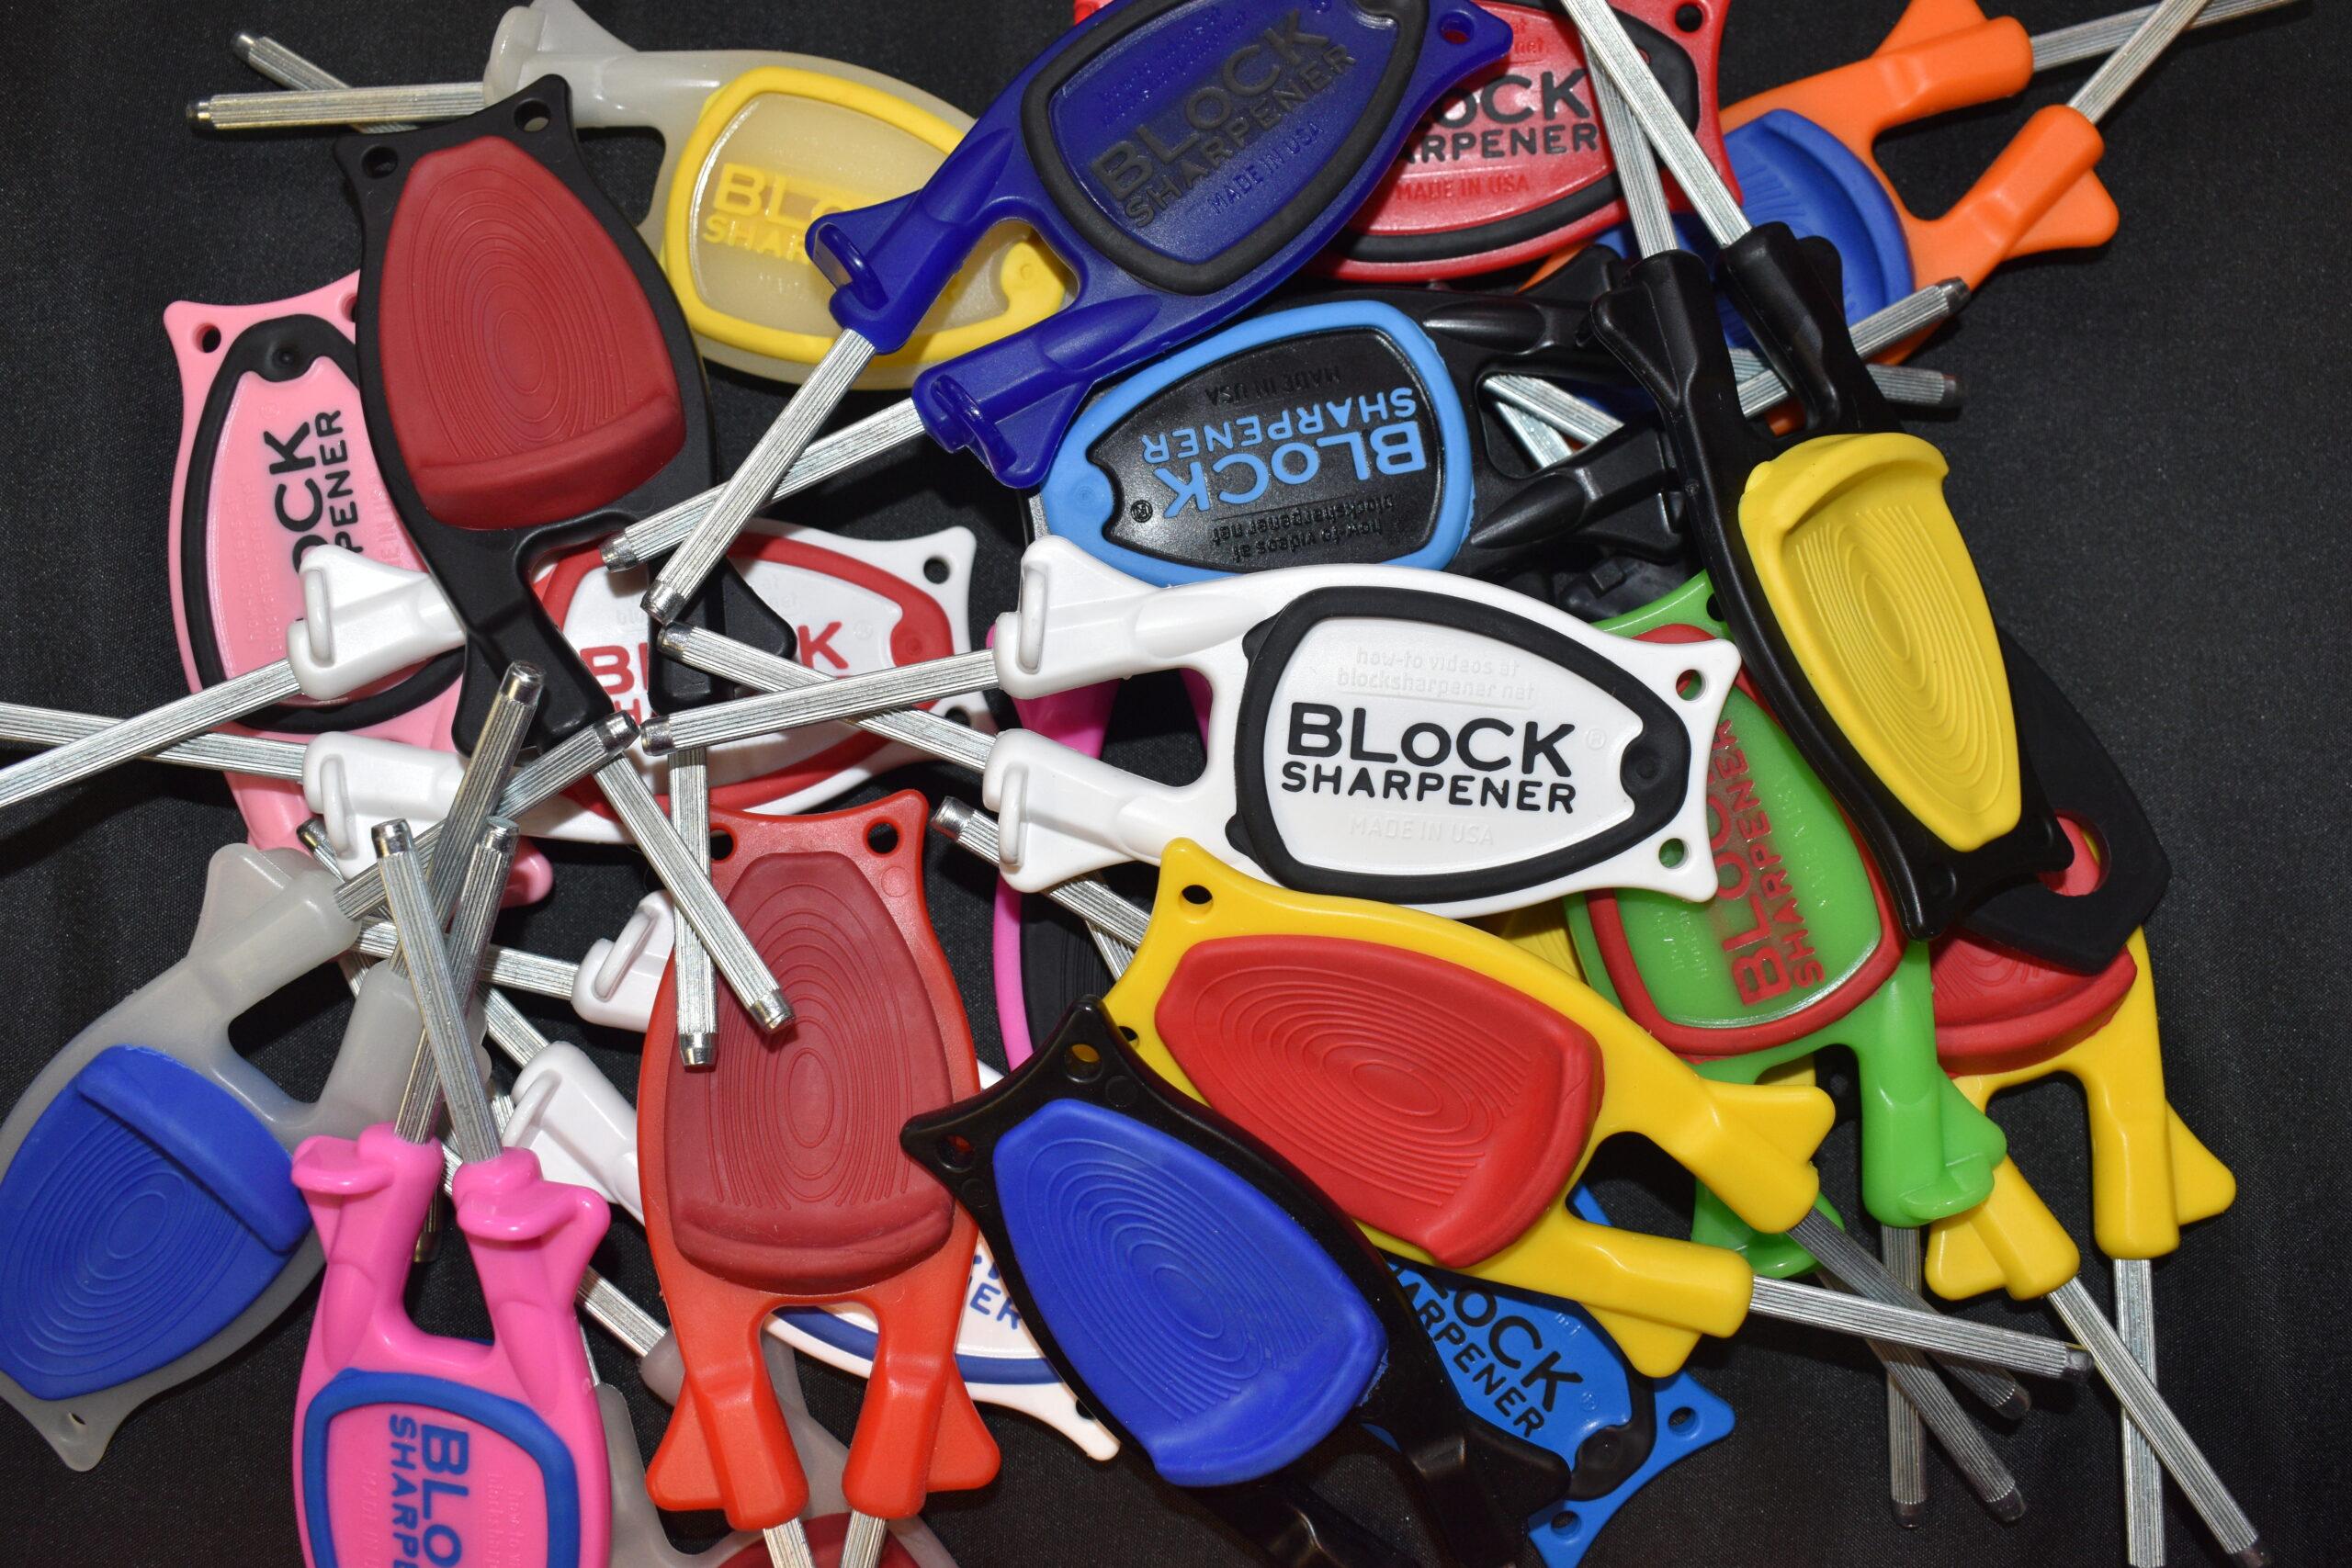 Handheld Knife sharpeners for sale